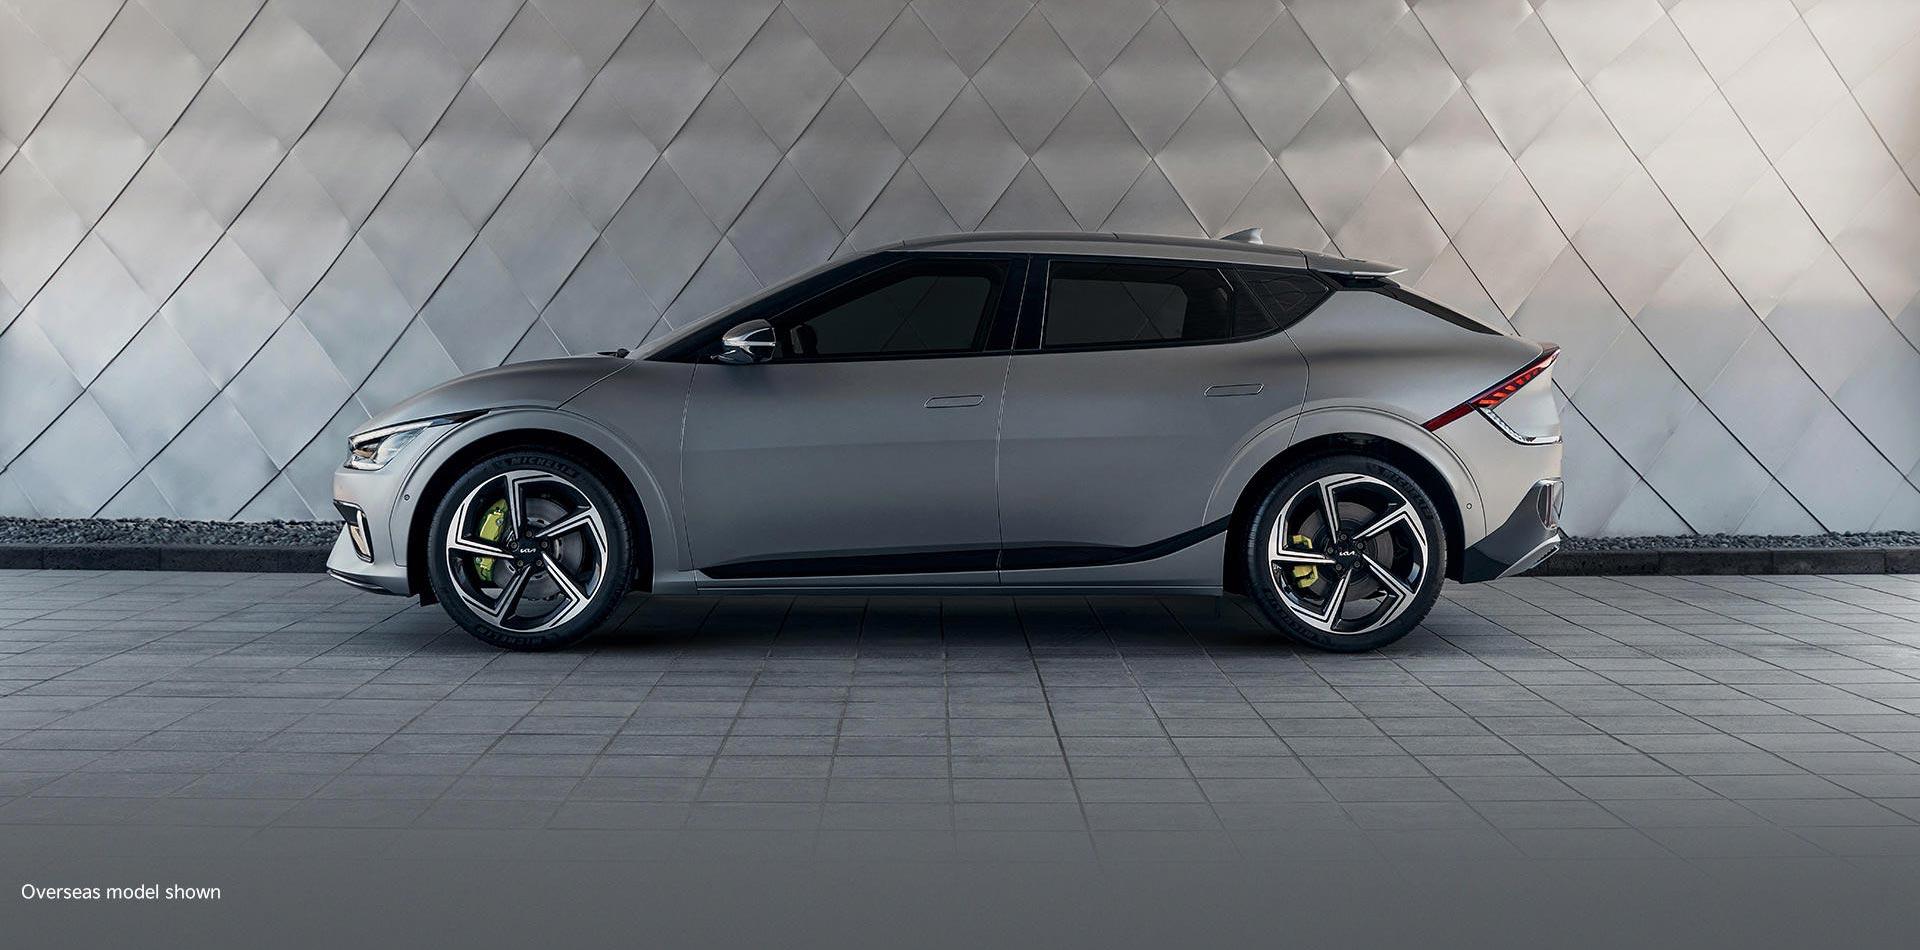 Kia-EV6-Overview